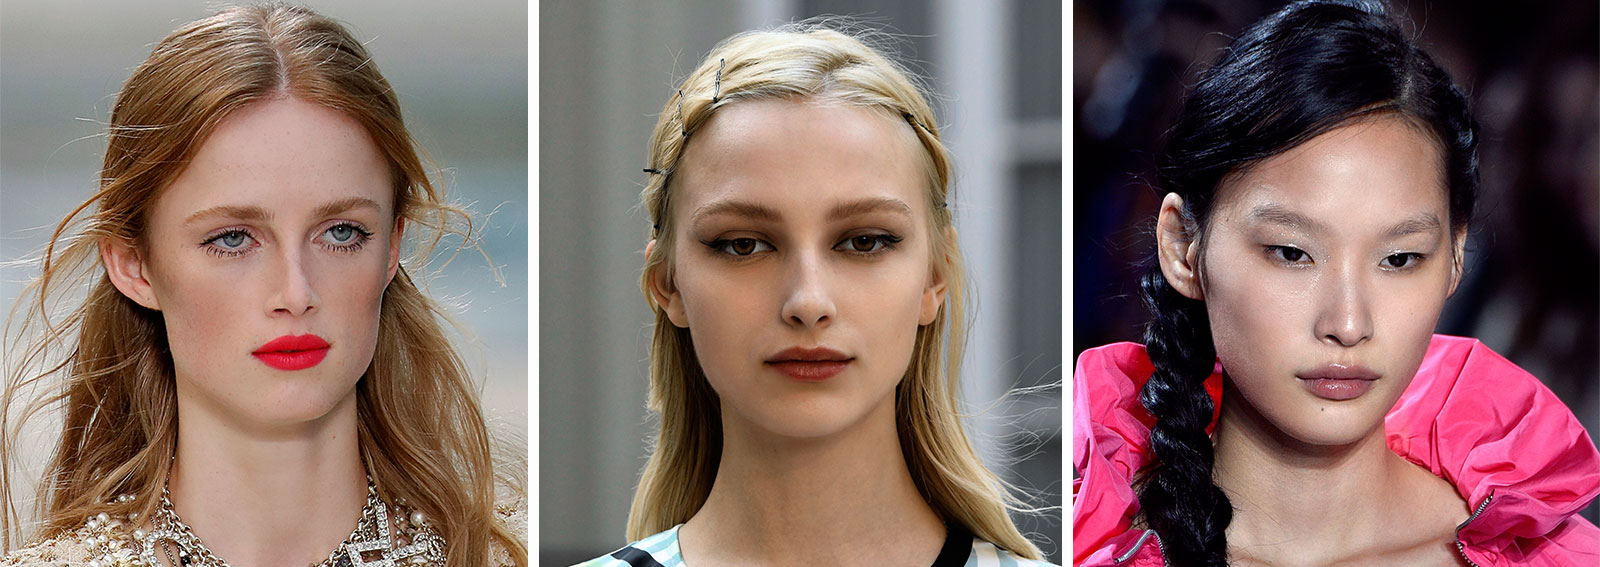 acconciature-capelli-lunghi-estate-2019-desktop